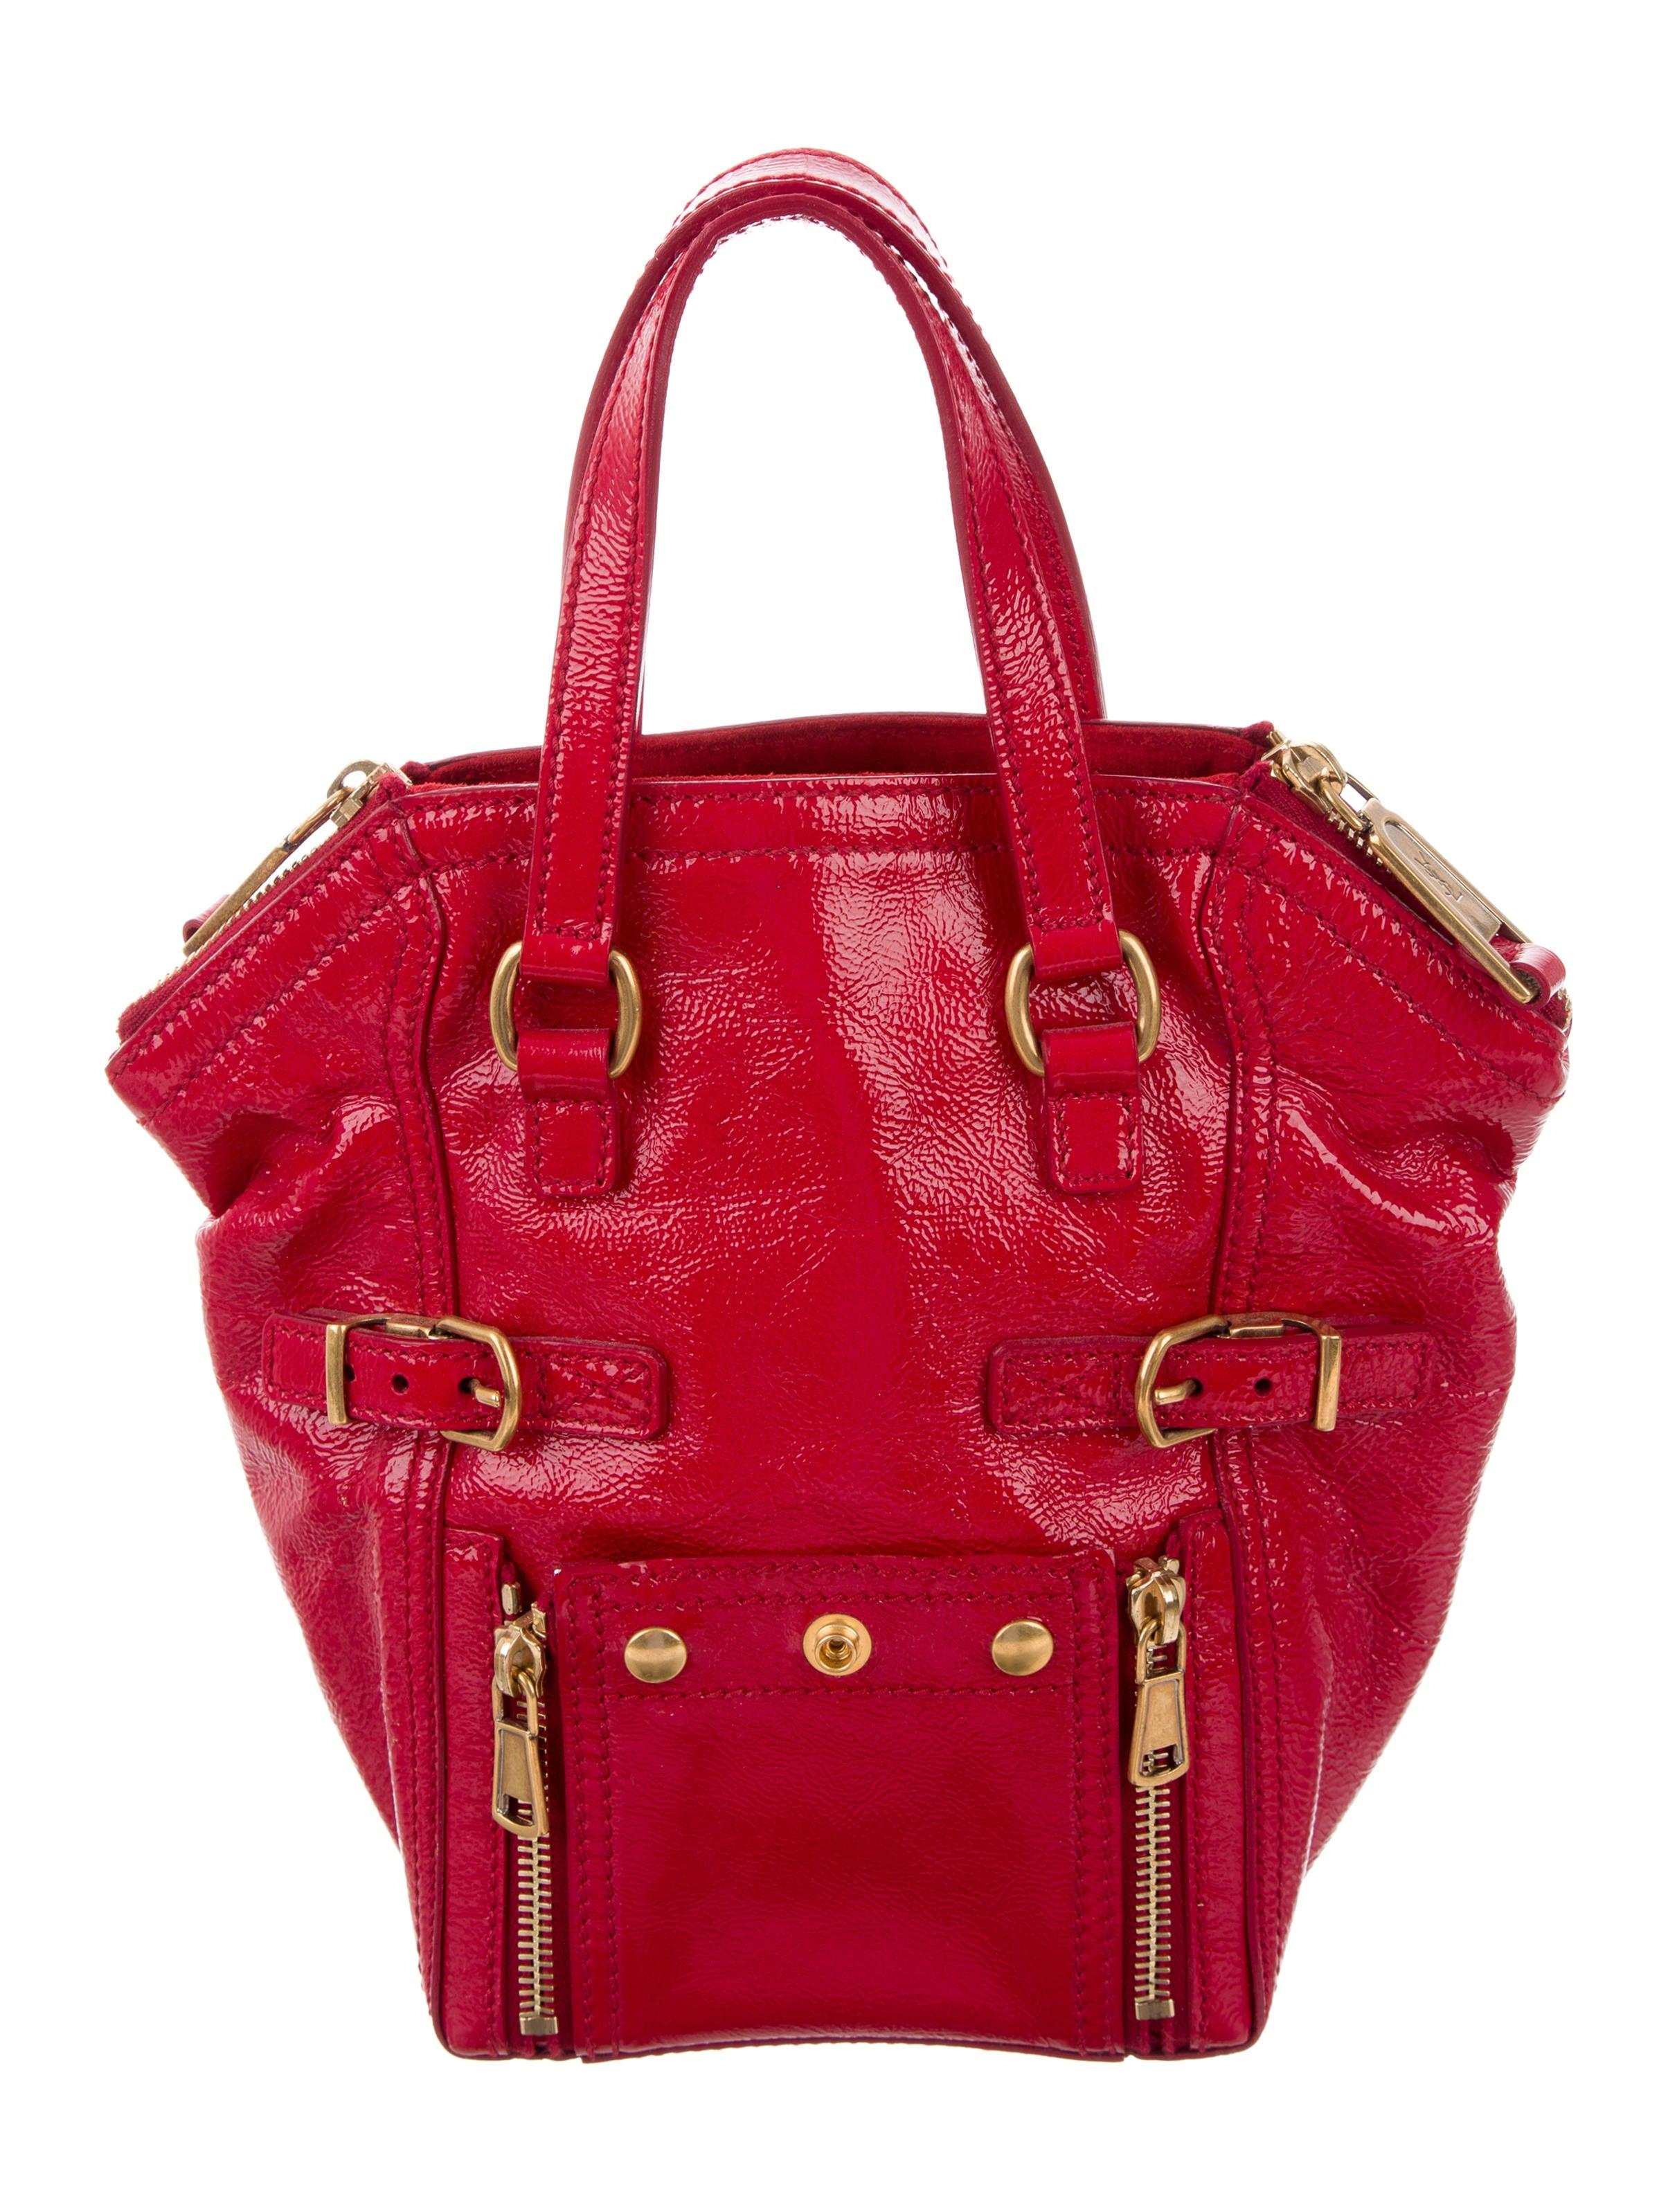 ba57e0b1fc2 Yves Saint Laurent Mini Downtown Tote - Handbags - YVE71003 | The ...